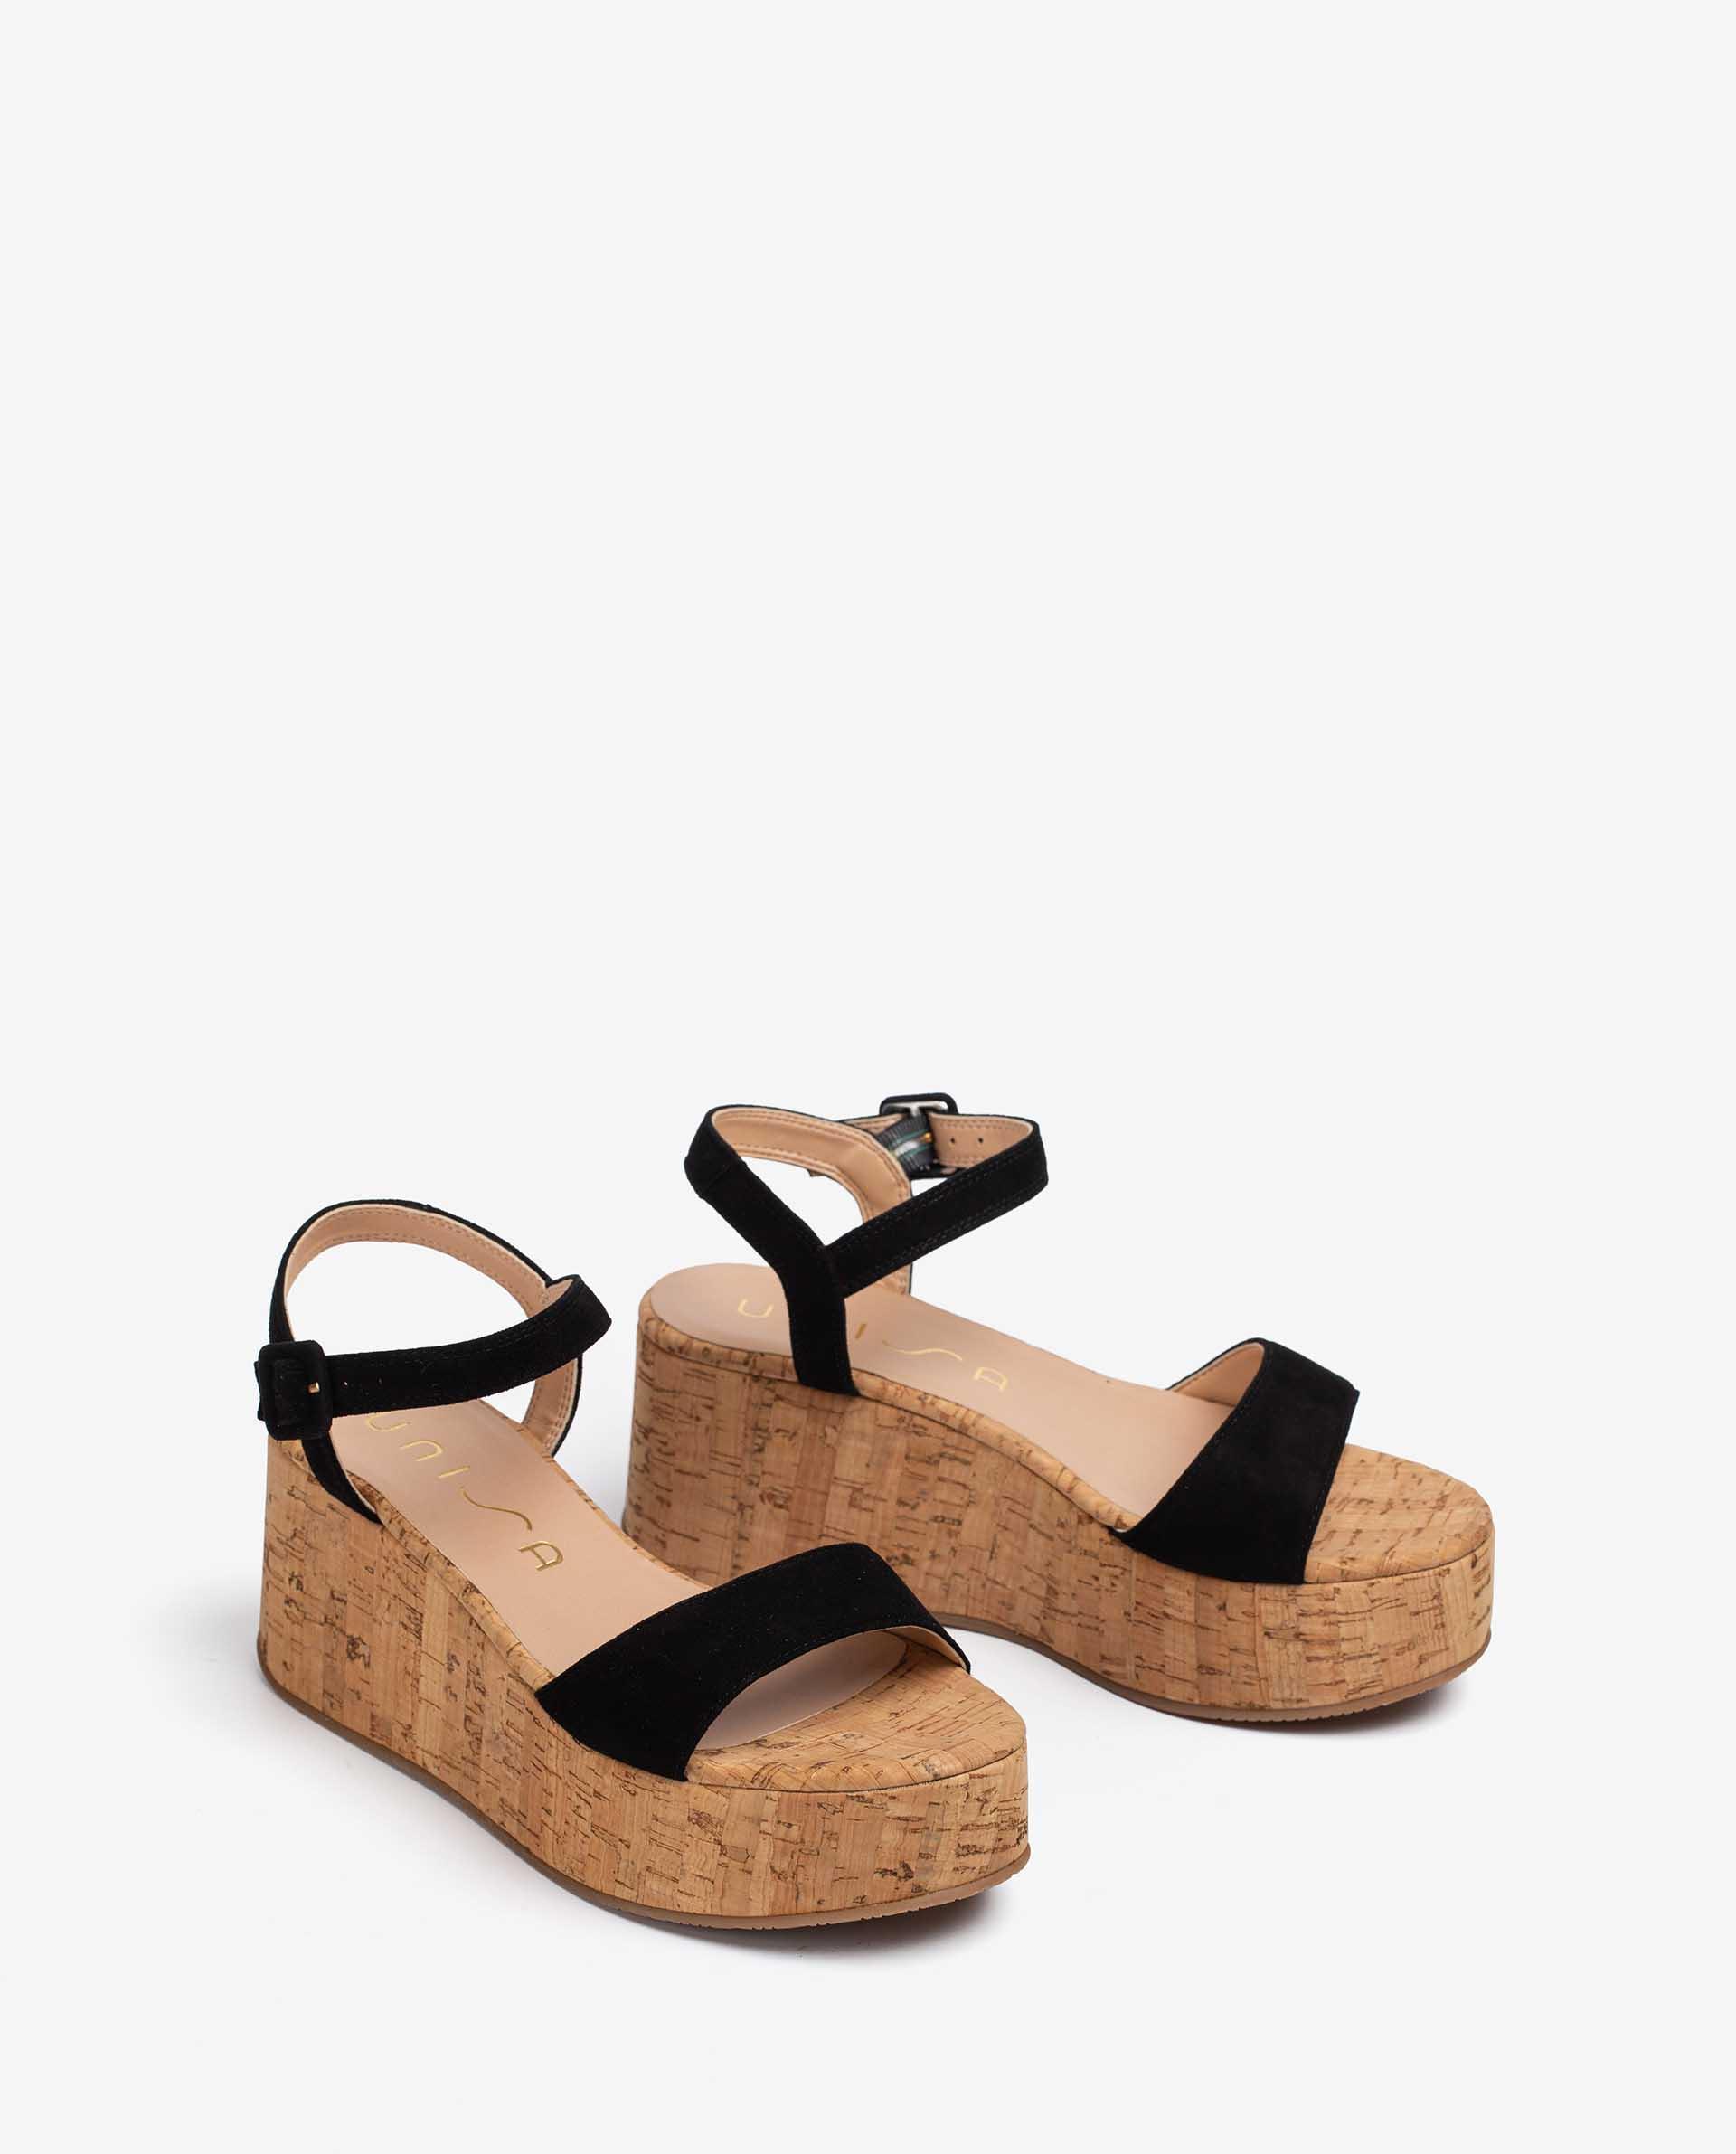 UNISA Kid suede sandals in assorted colours LAIKICO_KS 2